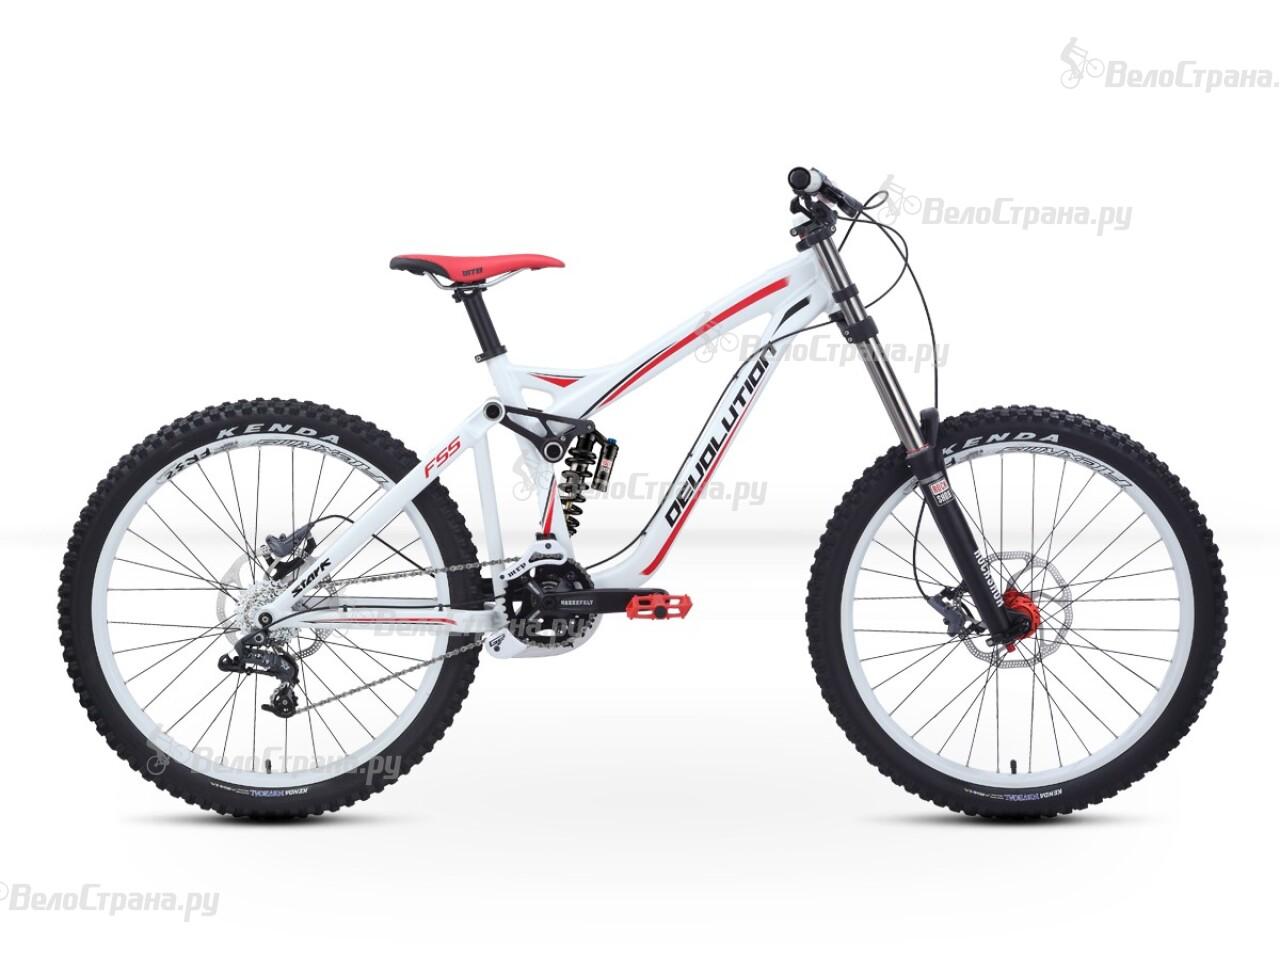 Велосипед Stark Devolution (2013) rockshox domain dual crown 2014